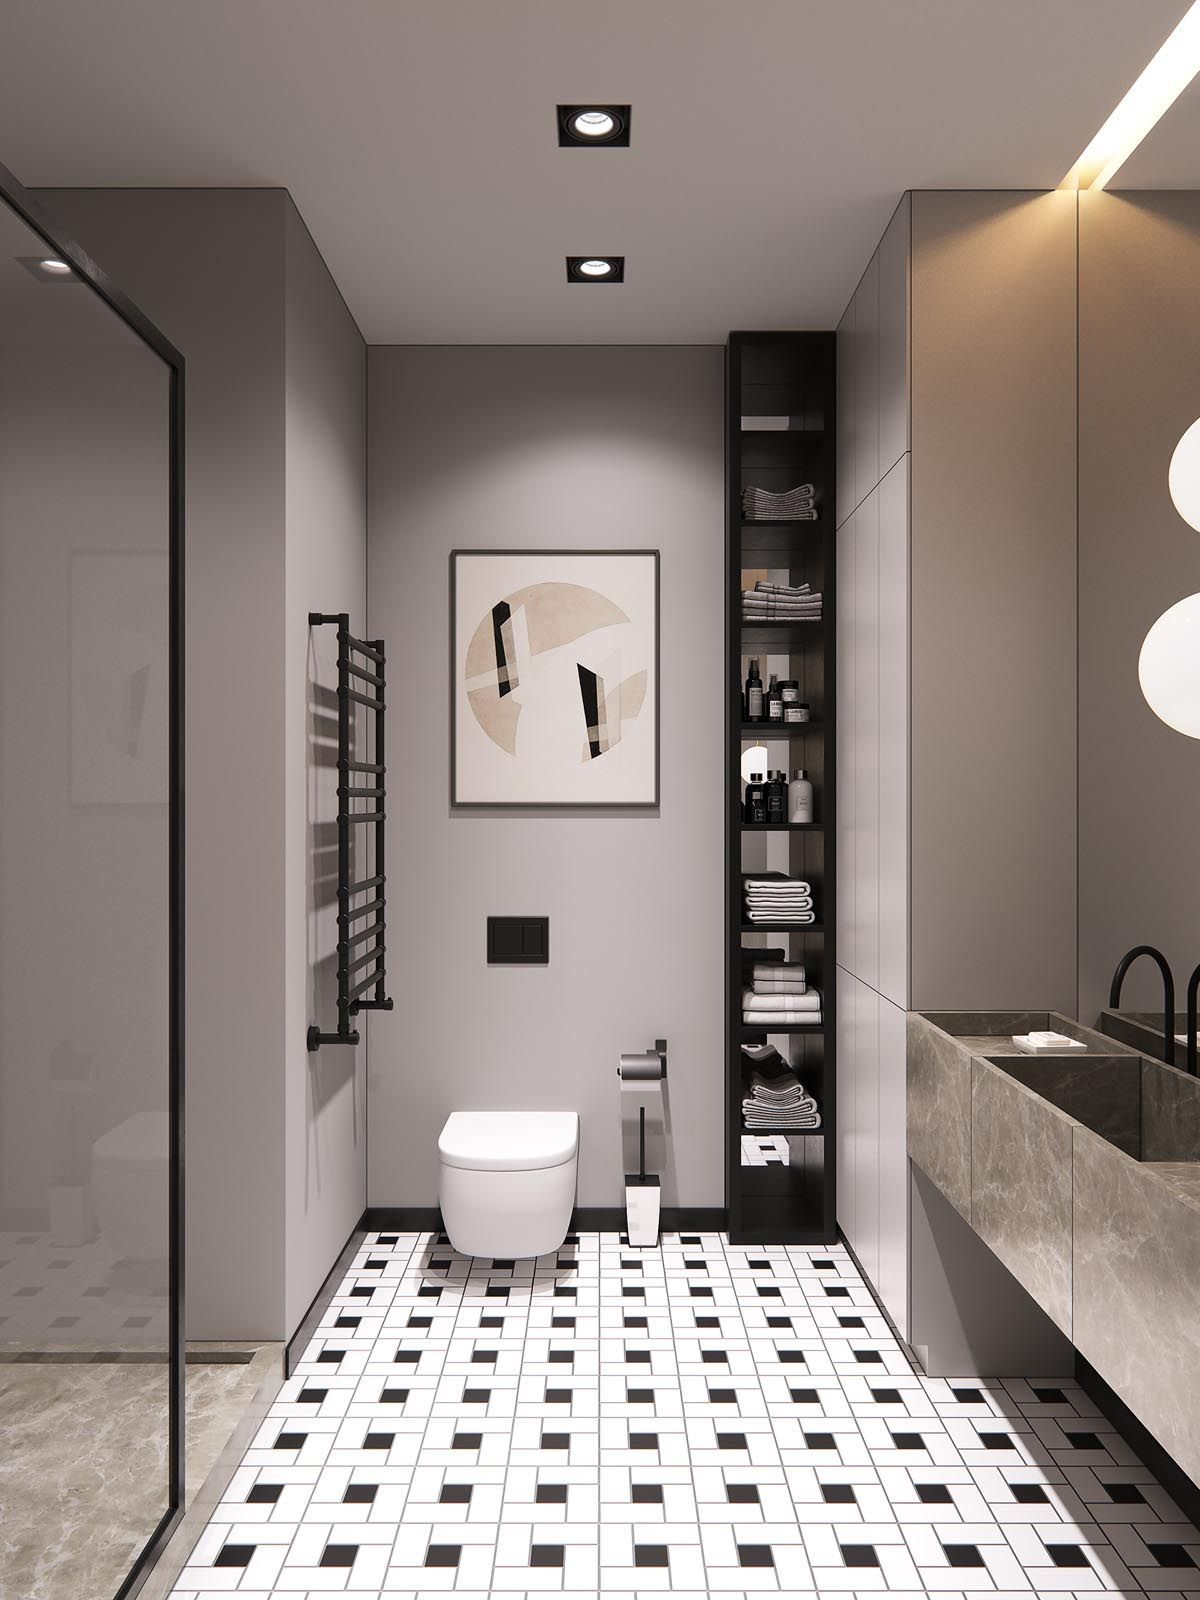 A Sleek Modern Home For A Stylish Young Family Bathroom Interior Bathroom Interior Design Minimalism Interior